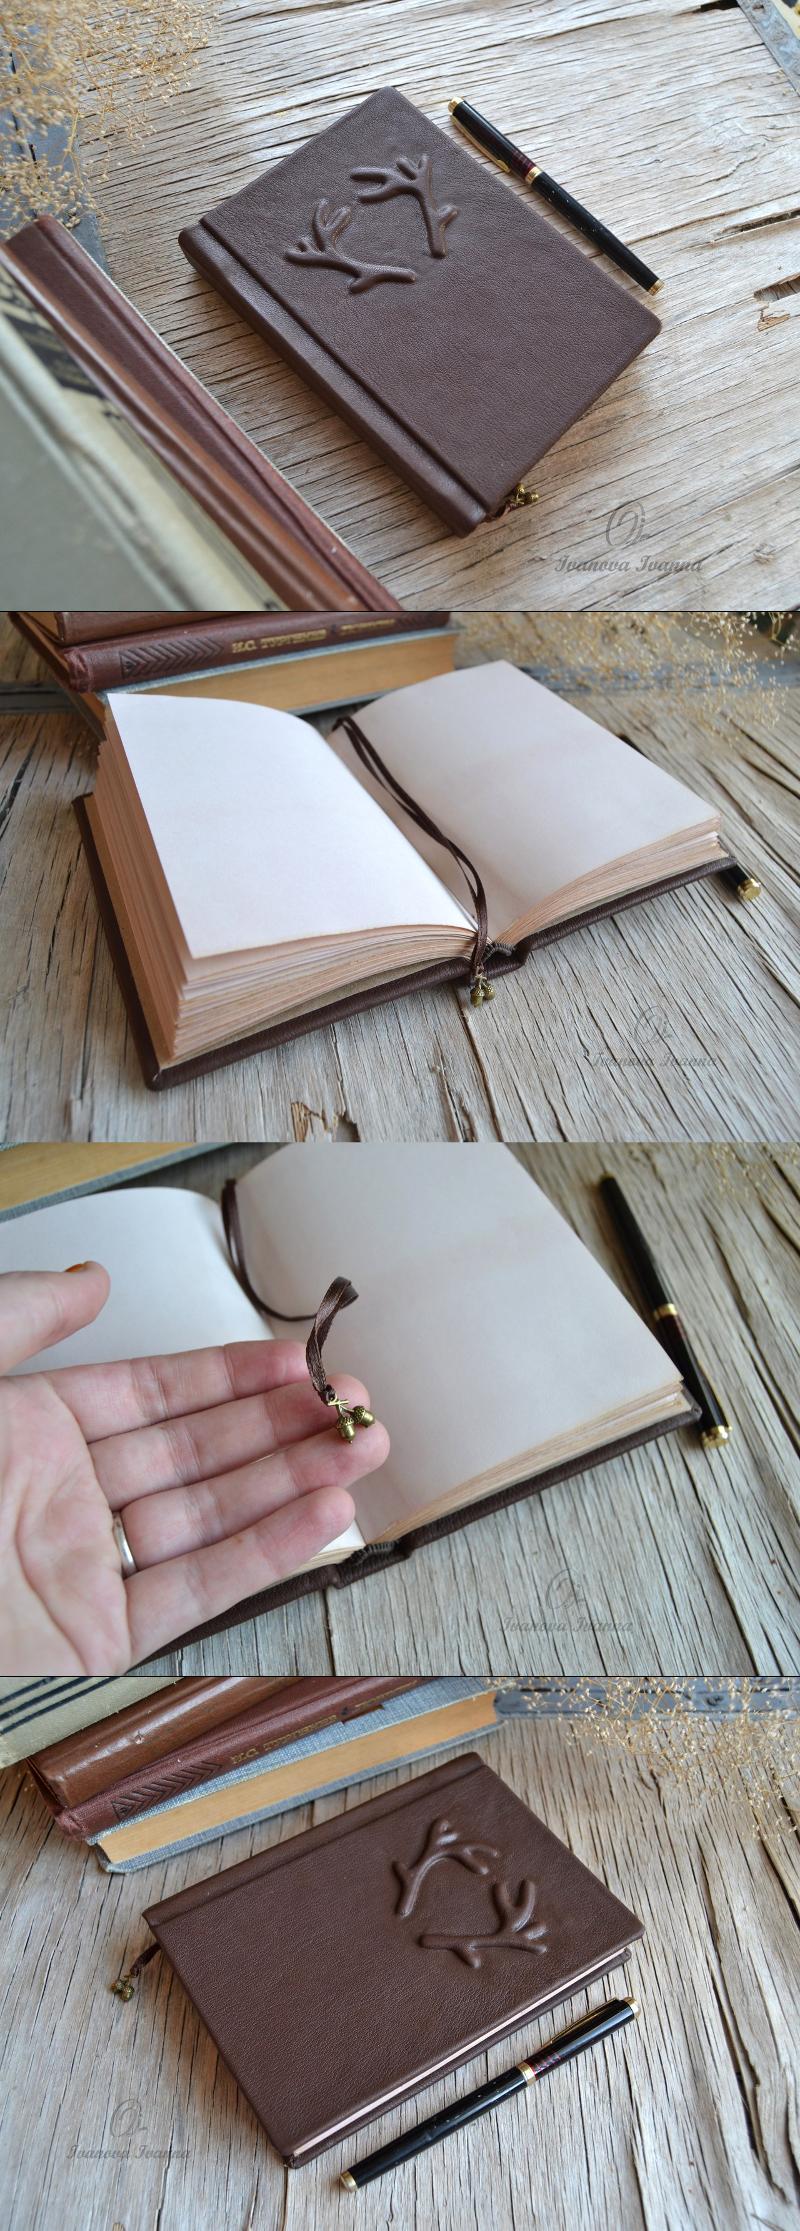 Handmade Brown Leather Journal Handcraft Bookbinding Leather Journal Brown Leather Journal Book Binding Design